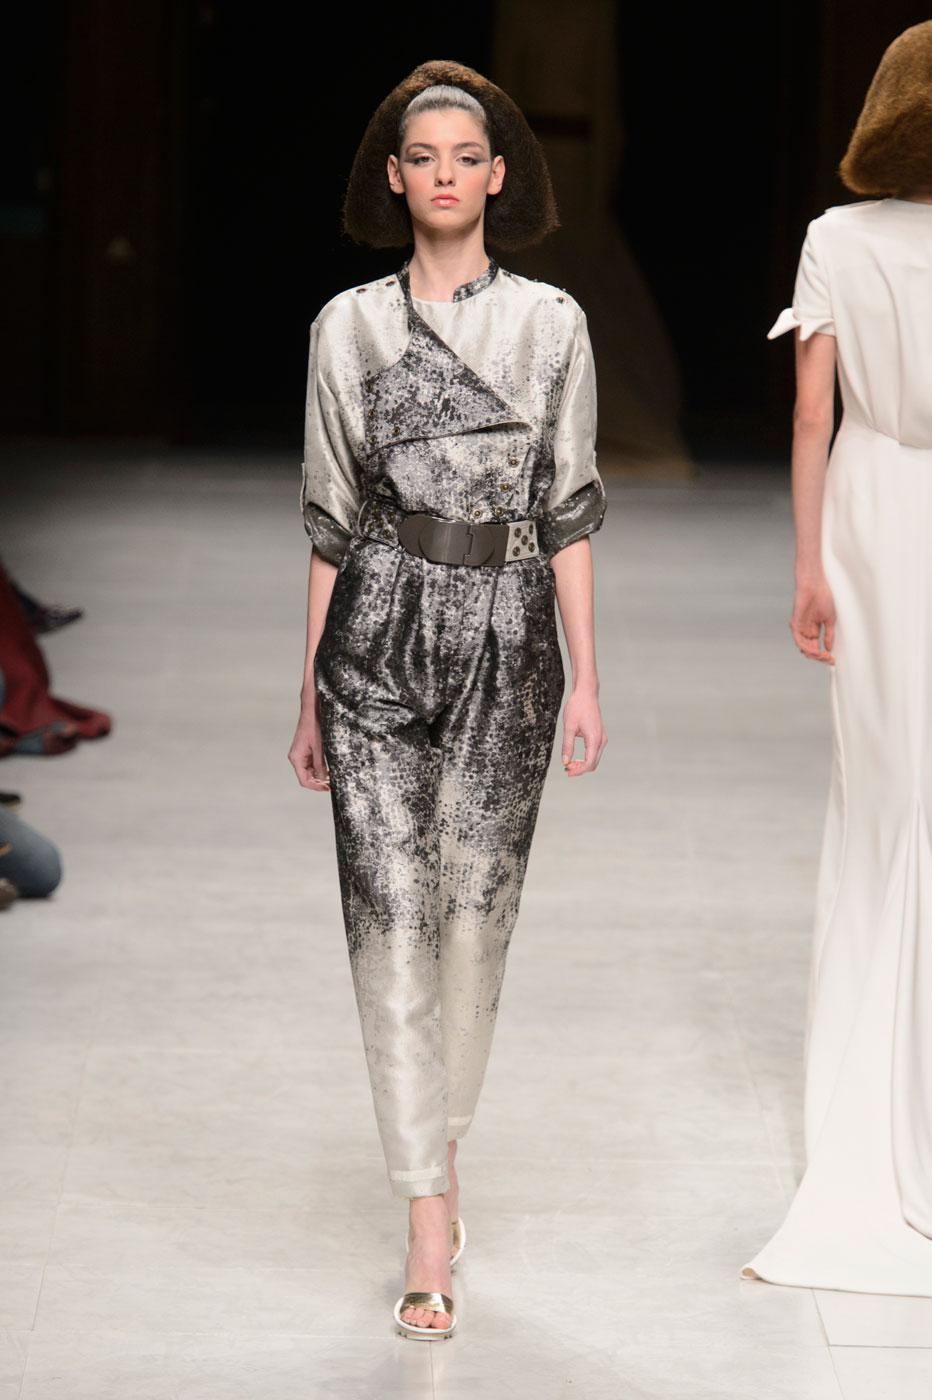 Julien-Fournie-Prive-fashion-runway-show-haute-couture-paris-spring-2015-the-impression-30